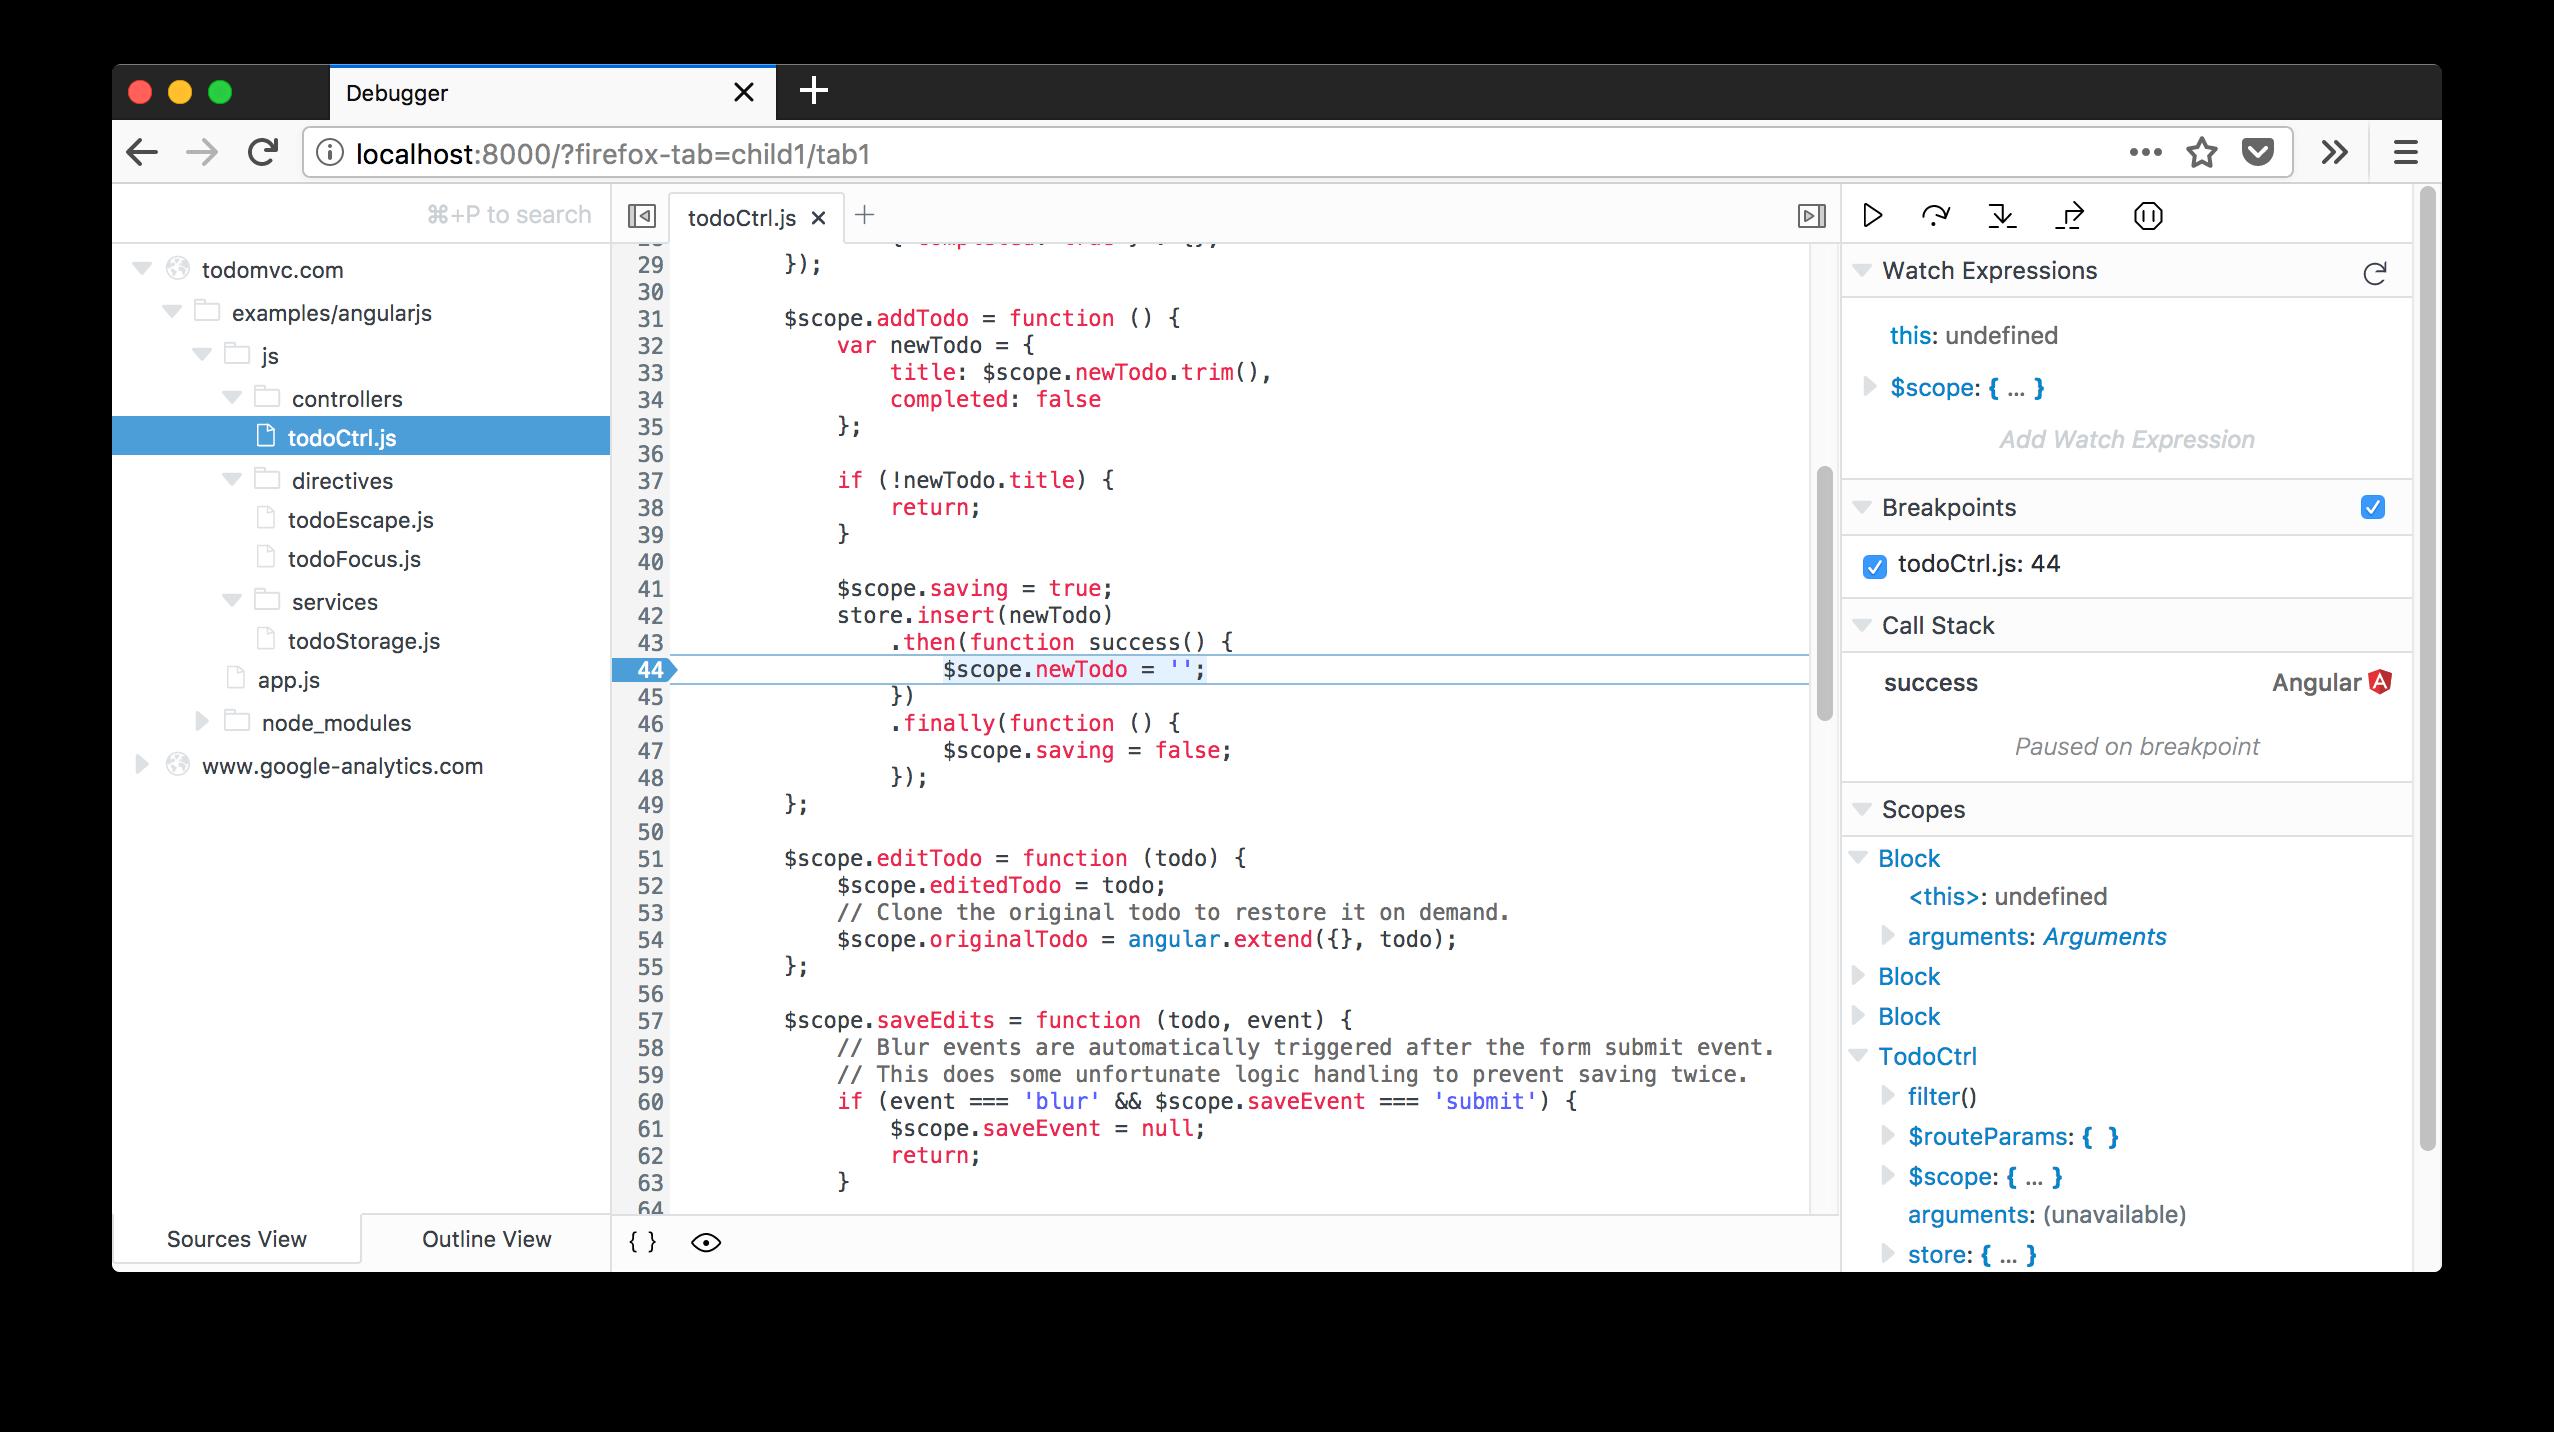 debugger-screenshot